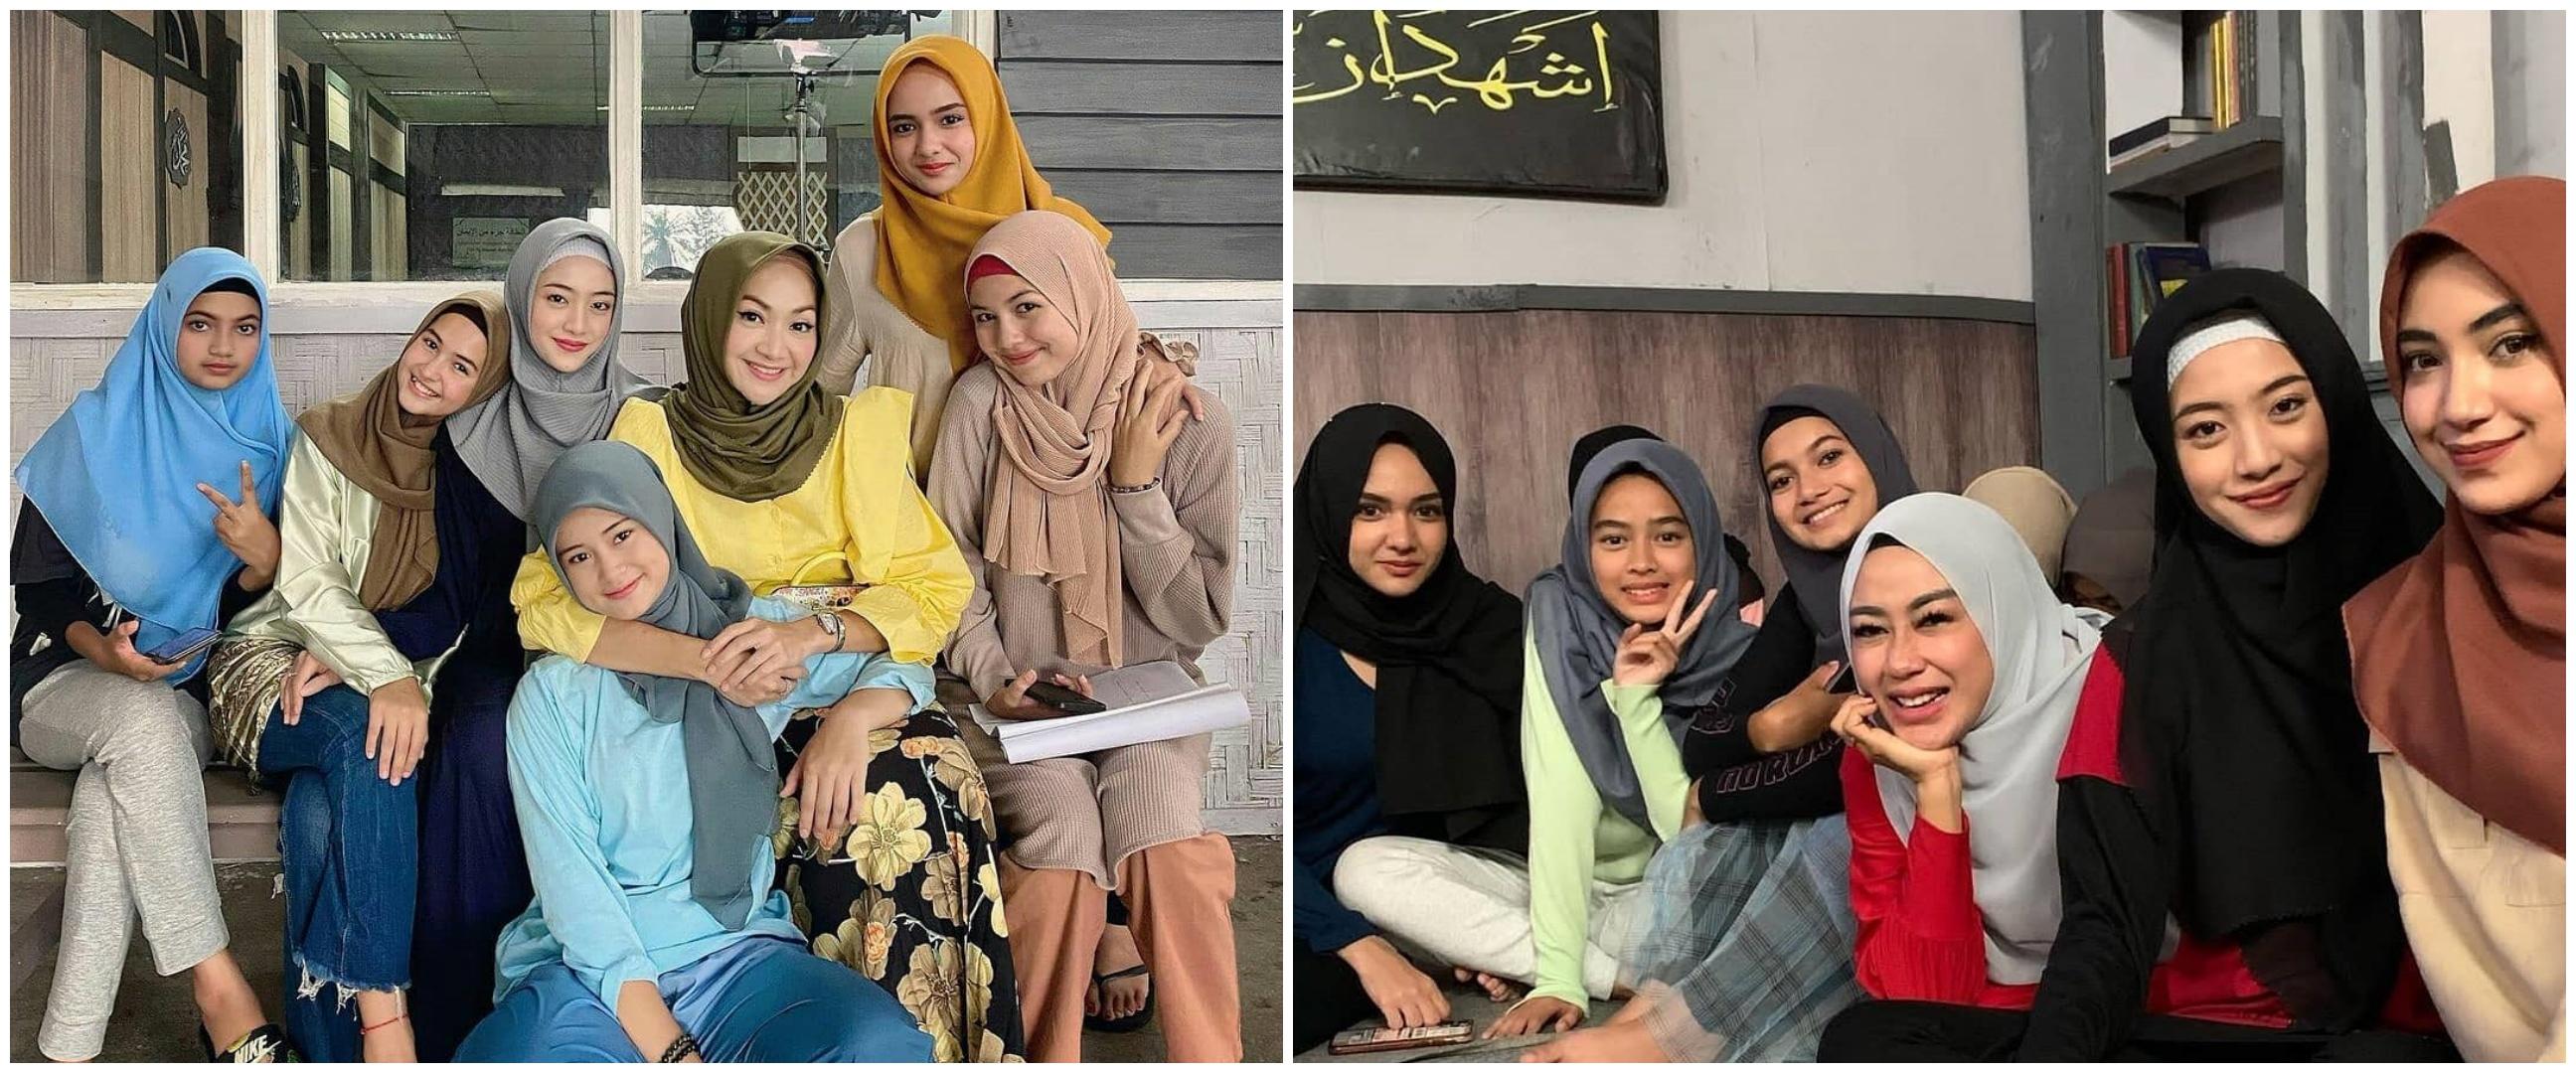 Potret 8 pemain Dari Jendela SMP pakai hijab, cantik dan anggun